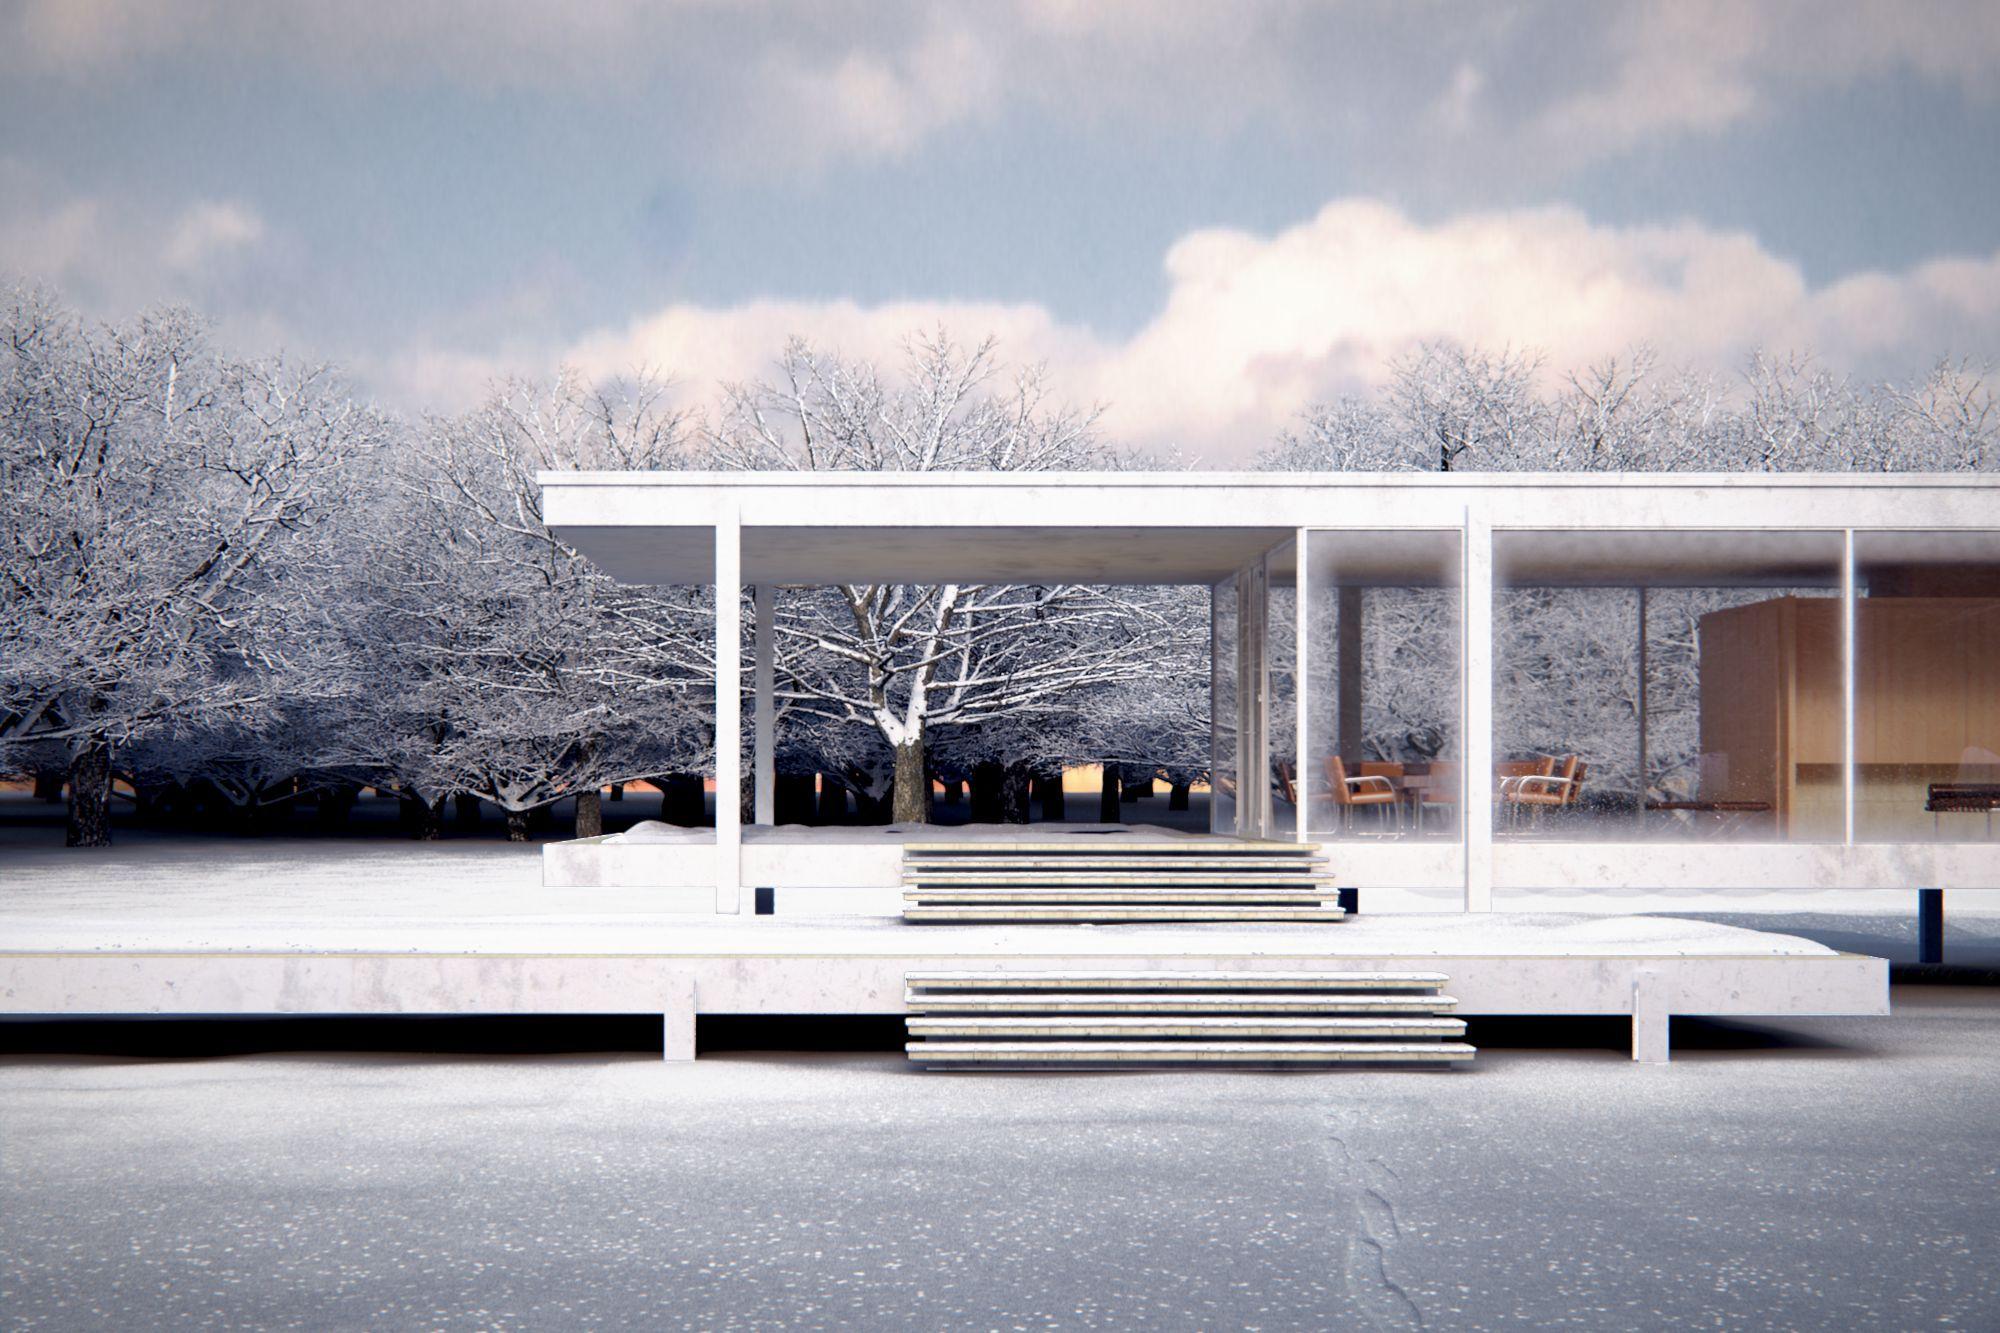 Clsicos de Arquitectura Casa Farnsworth  Mies van der Rohe  ArchDaily Mxico